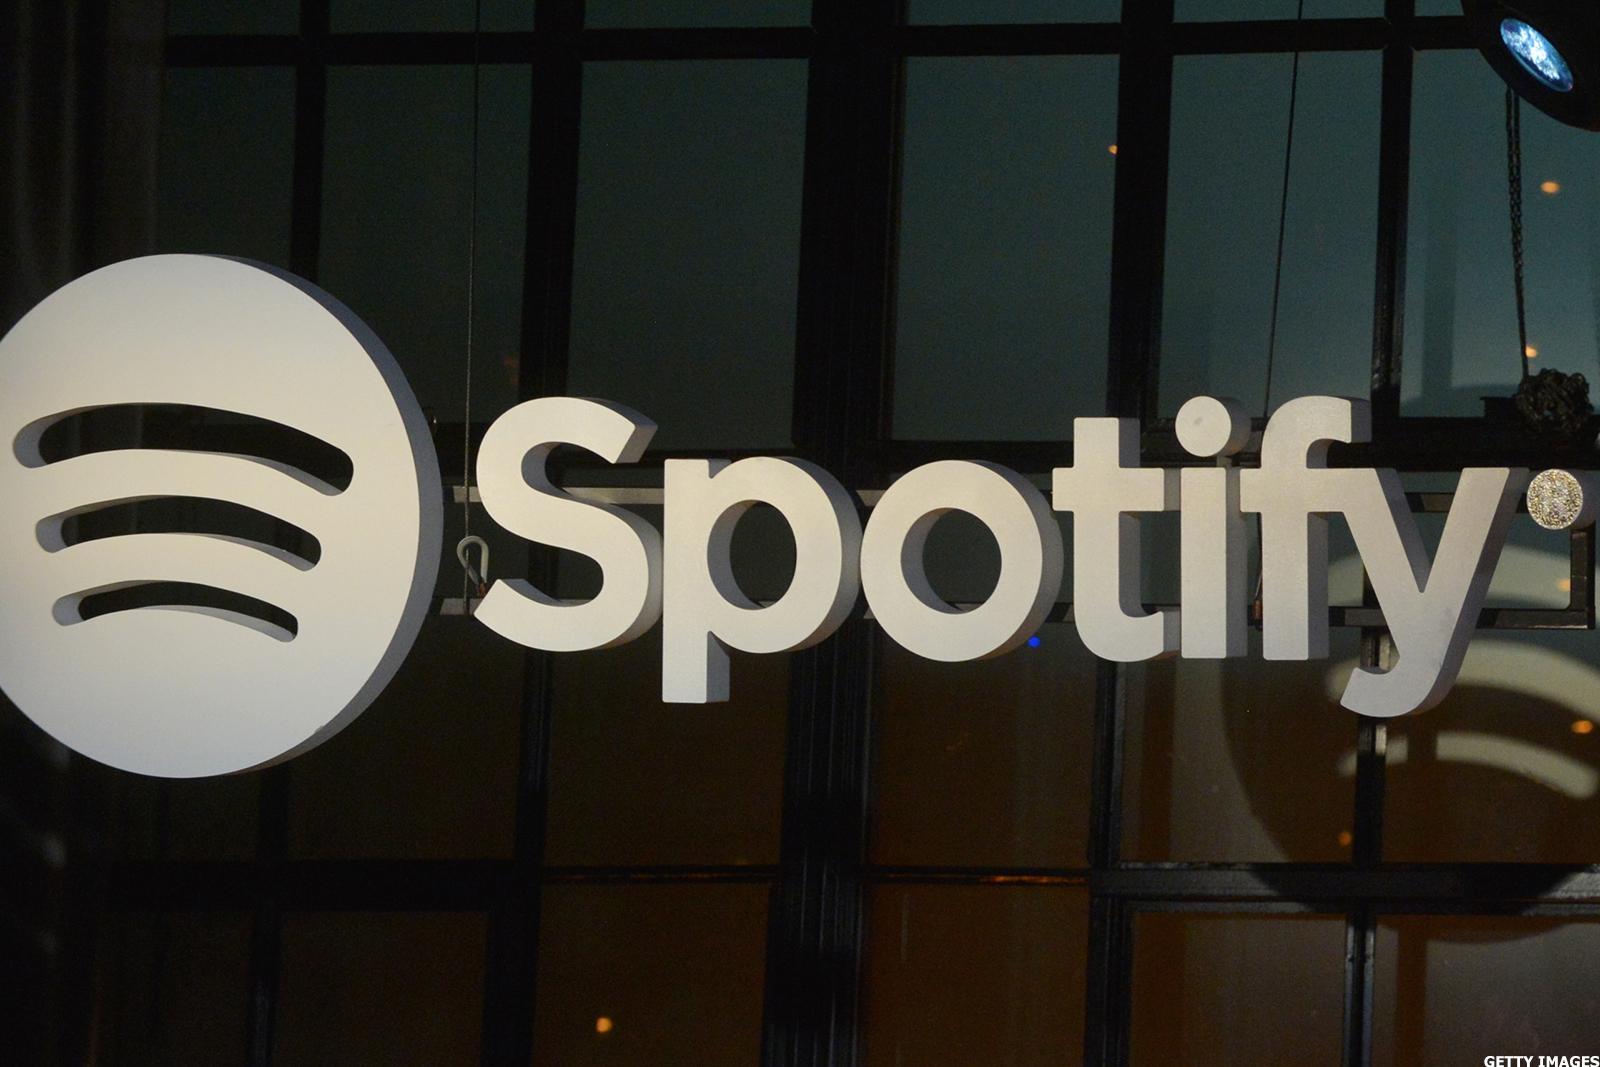 Report: Spotify Deal Solves $1 Billion Loan Problem Ahead of